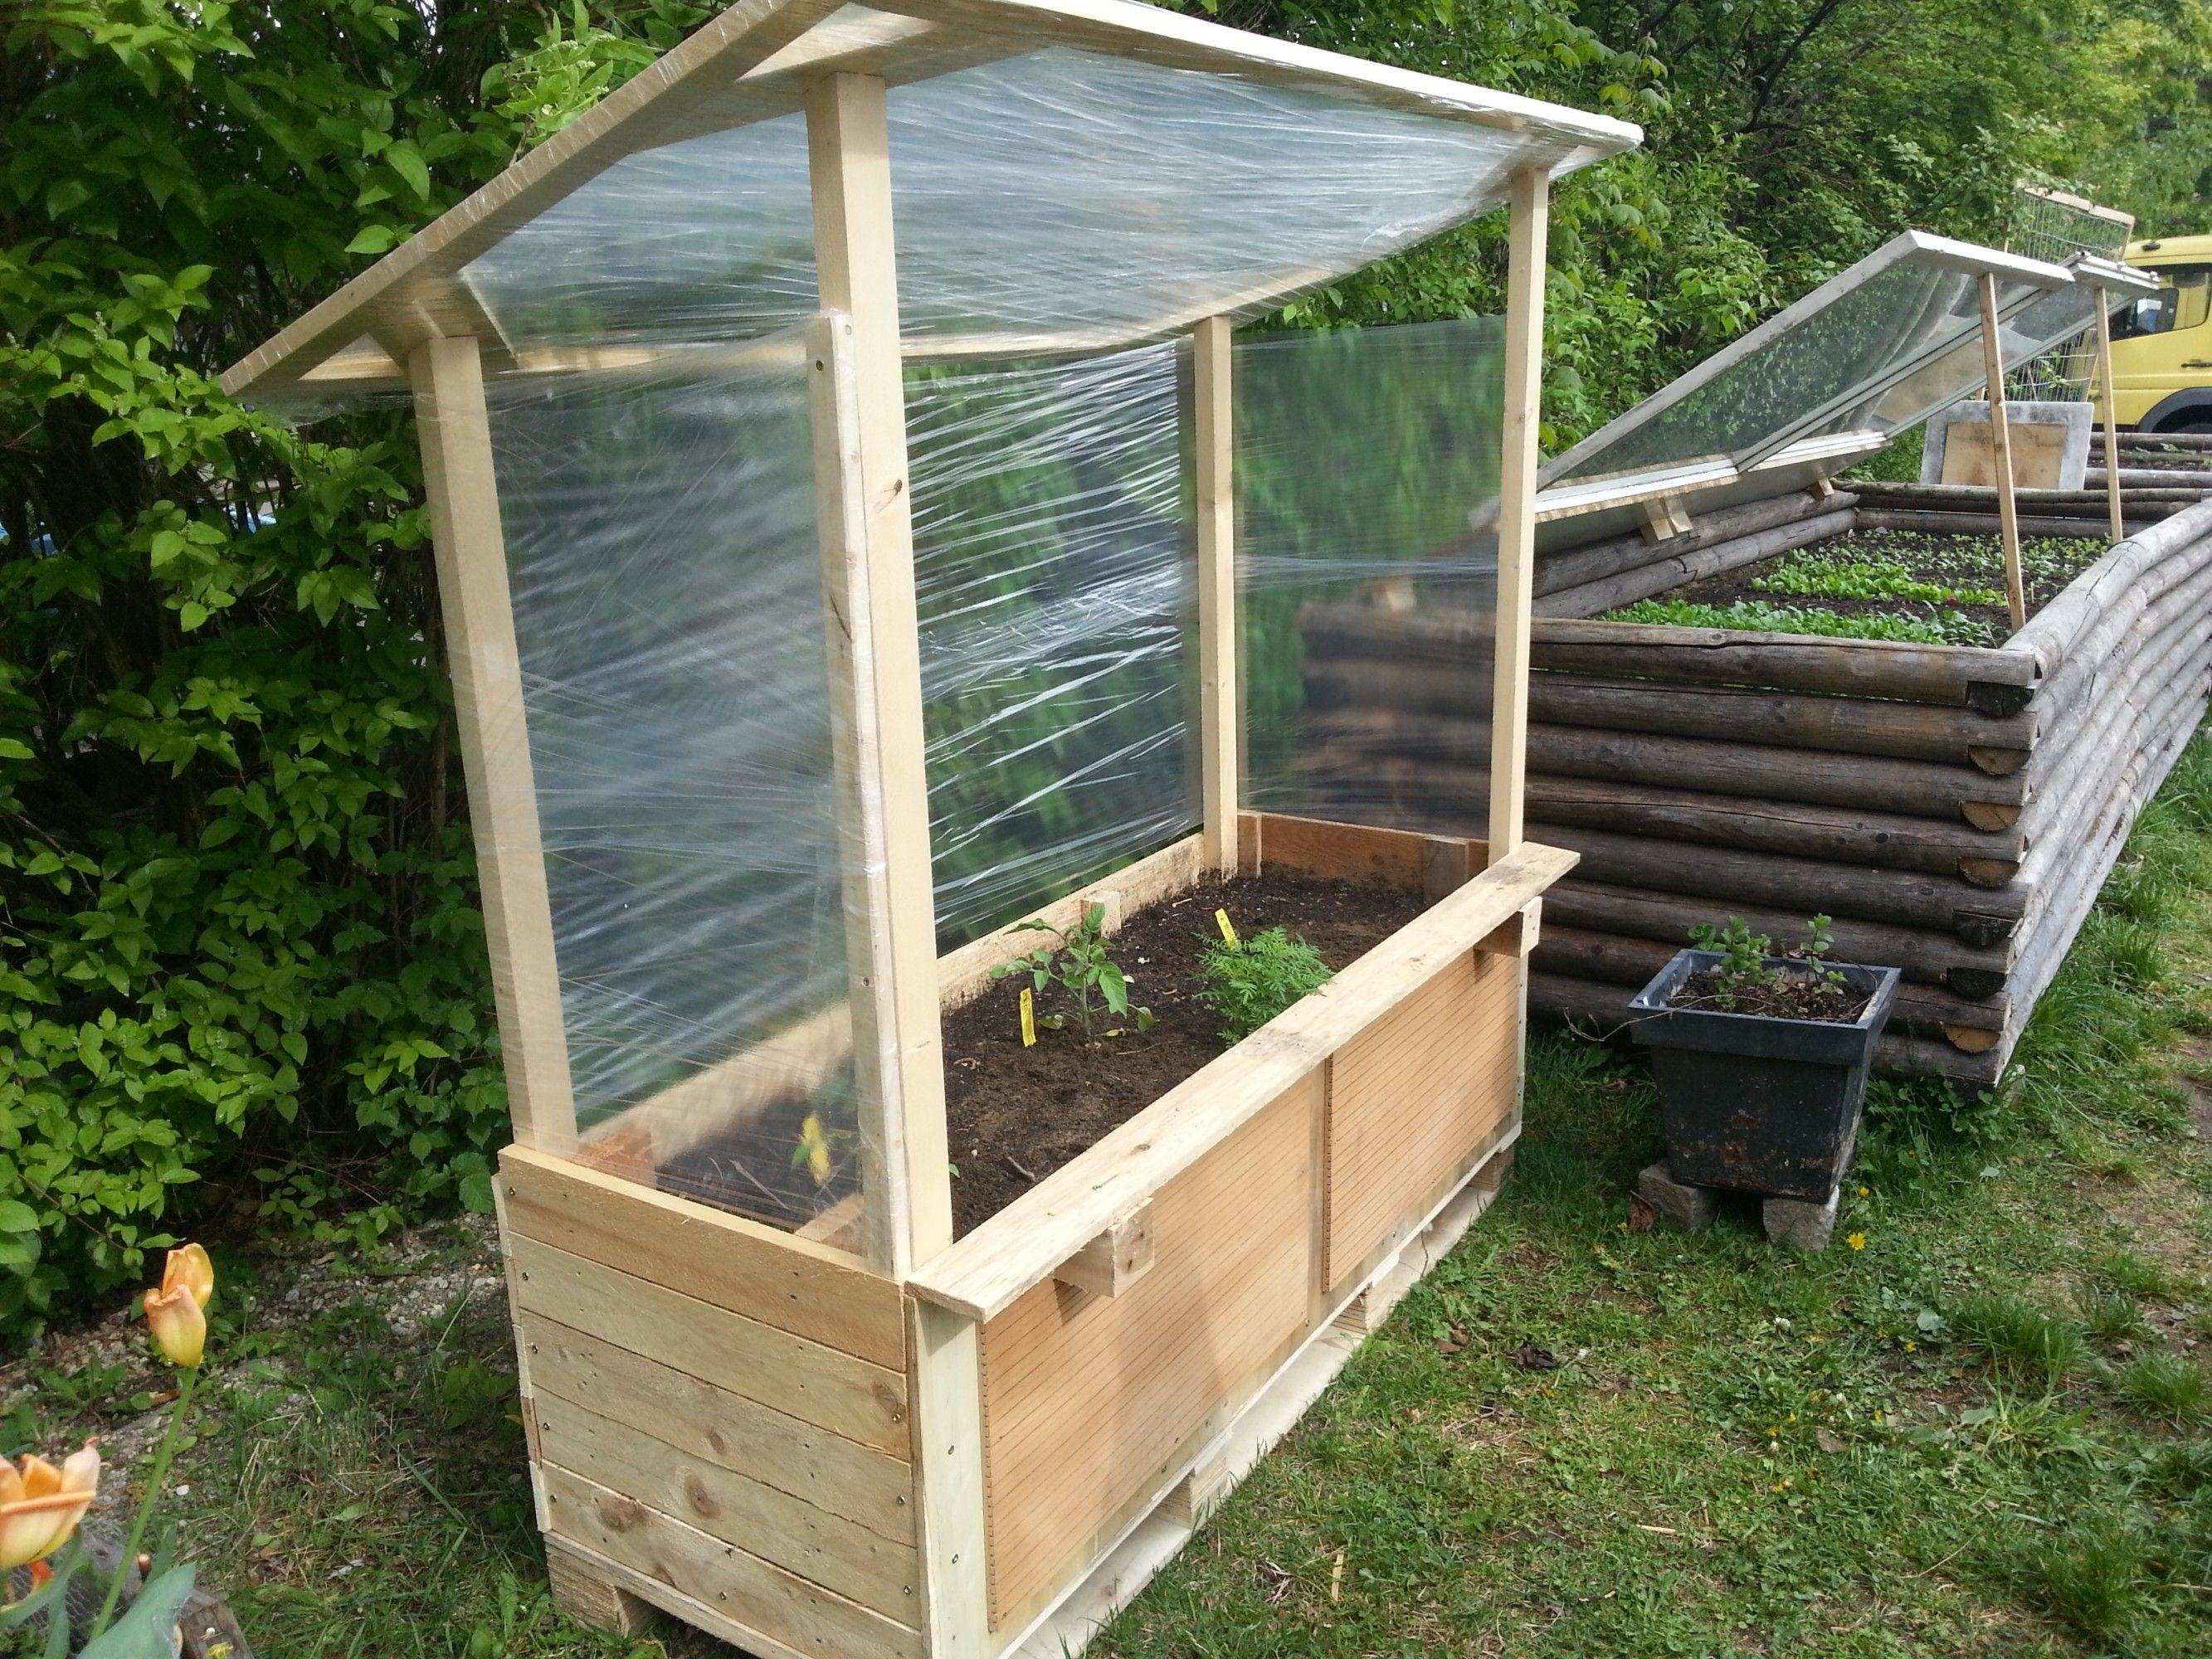 Tomatenhaus8   Tomatenhaus selber bauen, Tomaten haus, Tomatenhaus